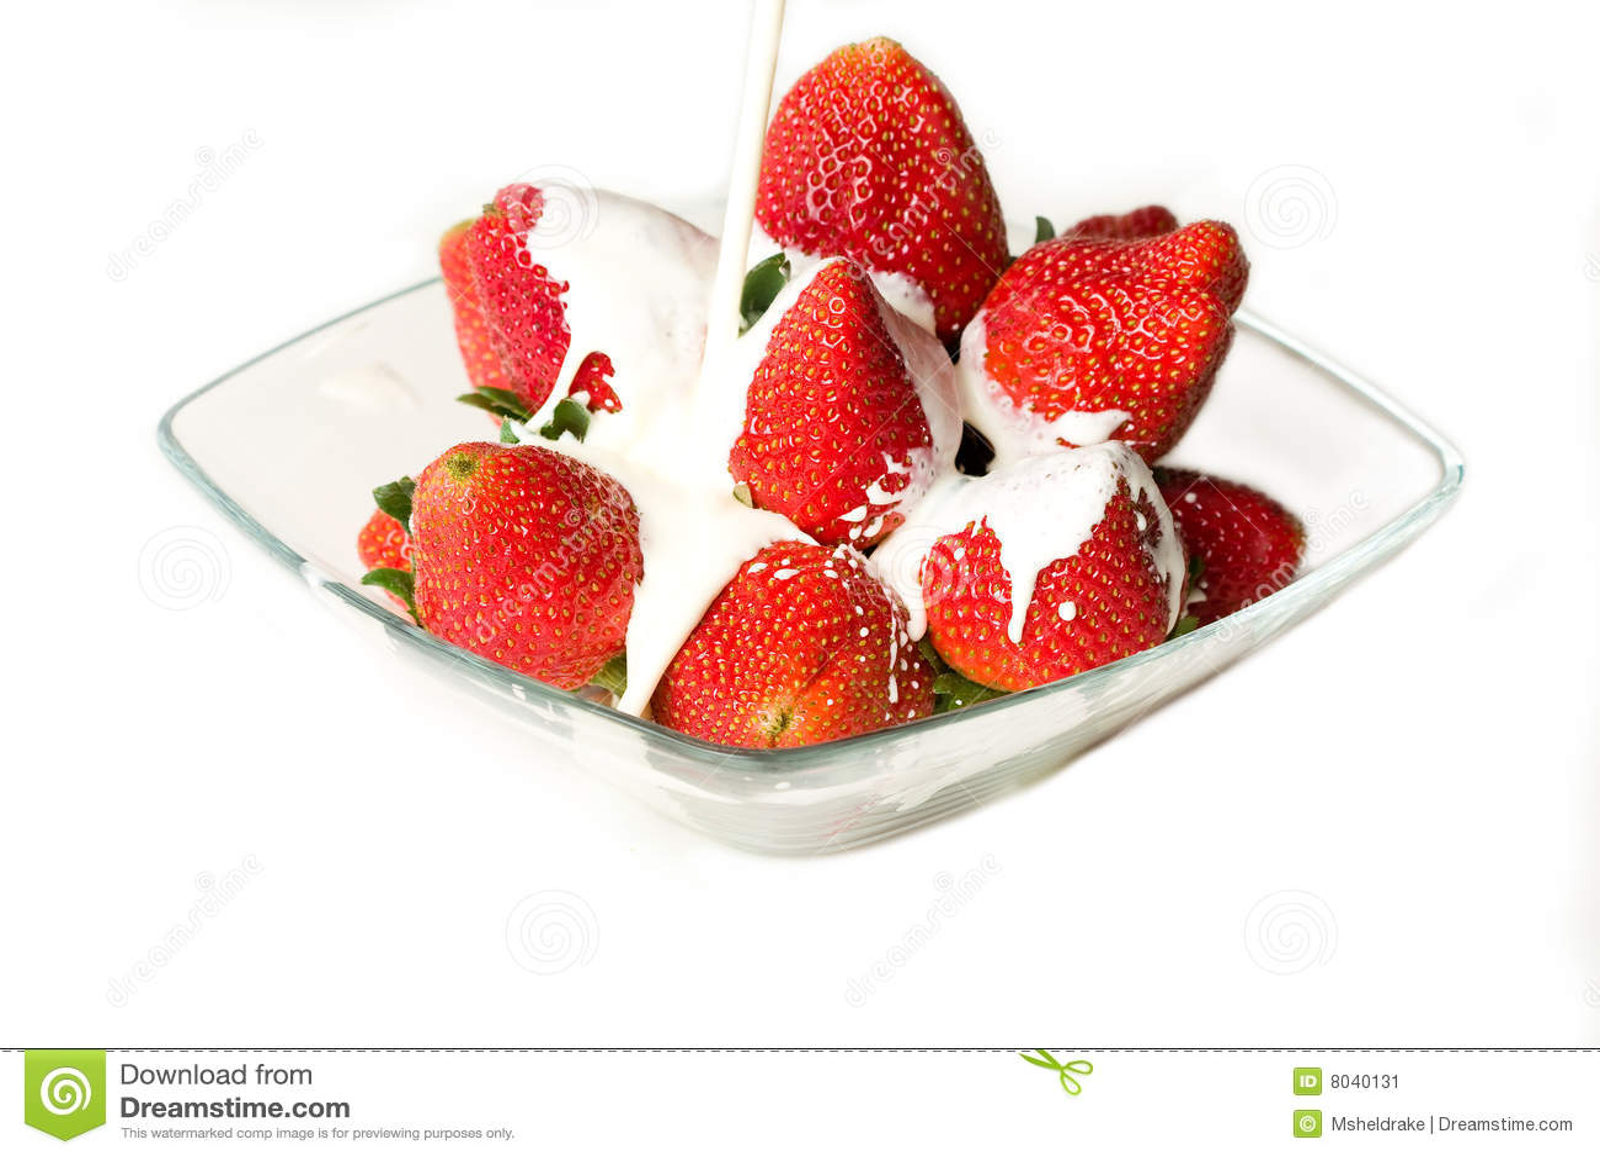 recipe: strawberries and cream [13]